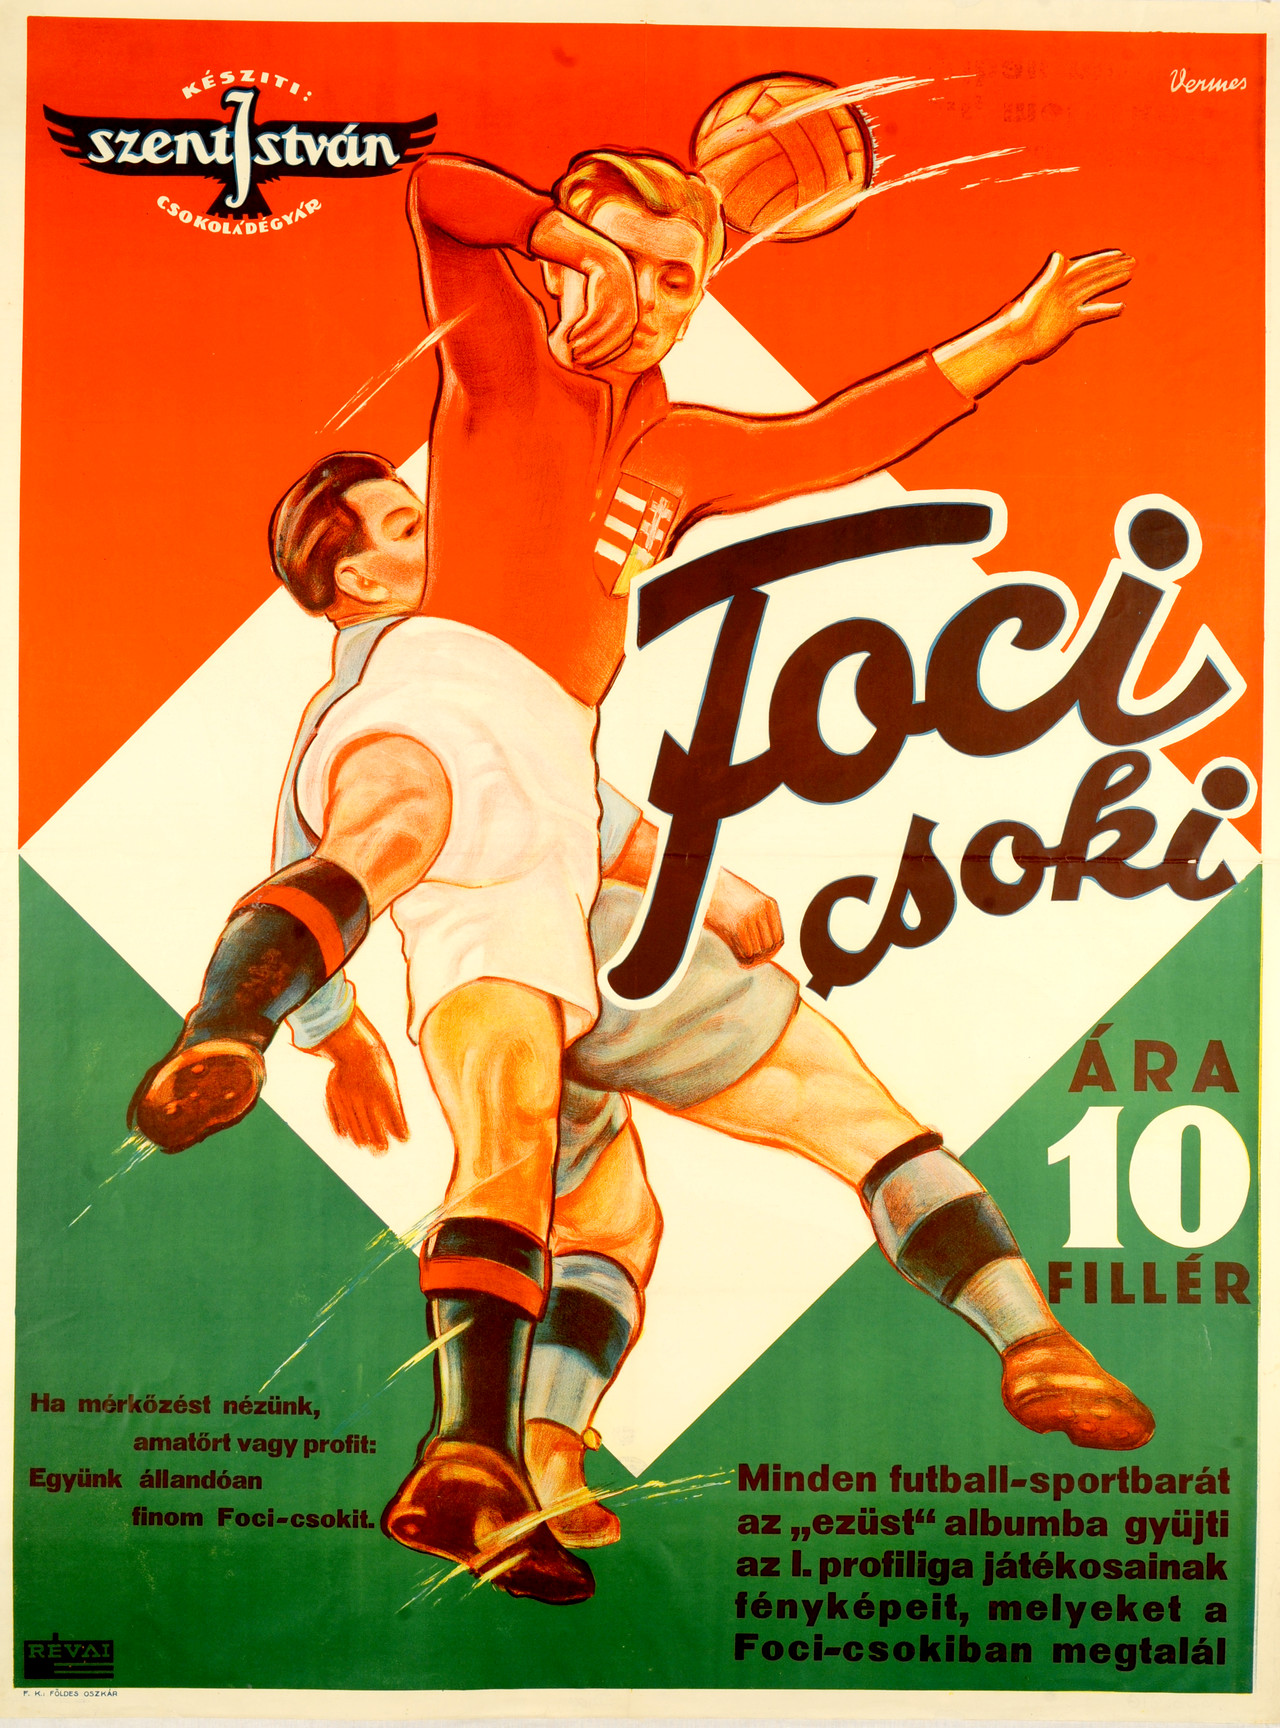 05_1934_foci_csoki_b.jpg